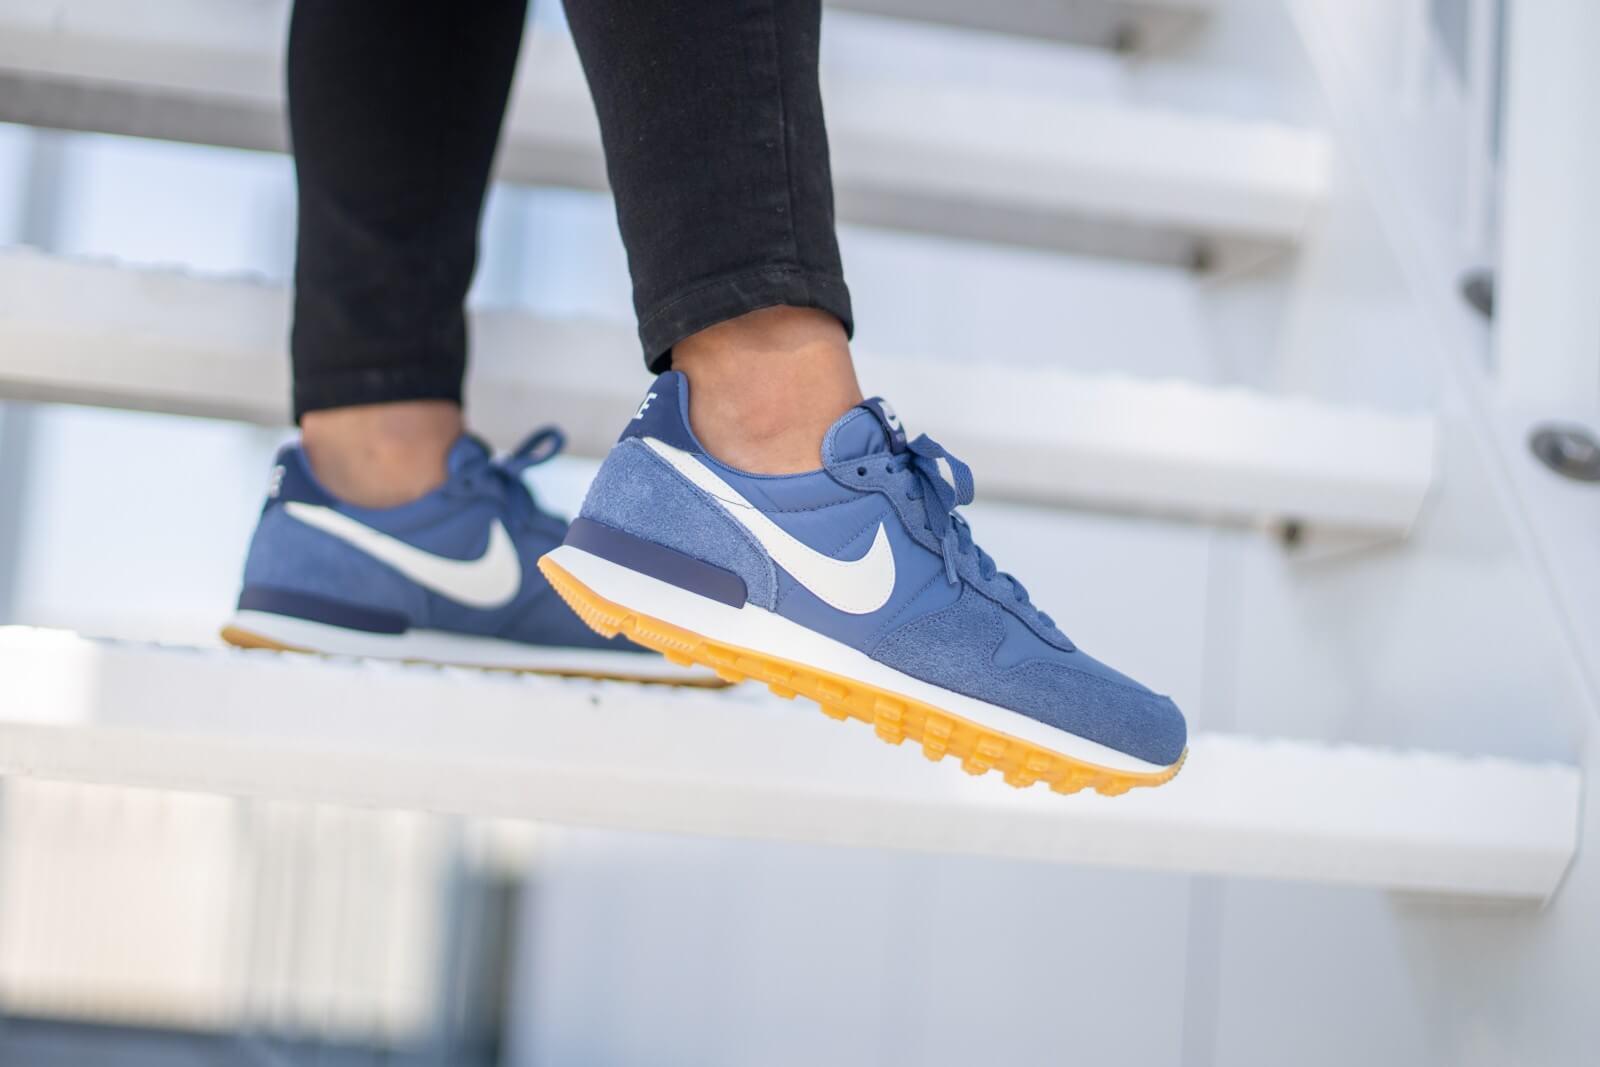 Nike Women's Internationalist Diffused Blue/Summit White - 828407-412